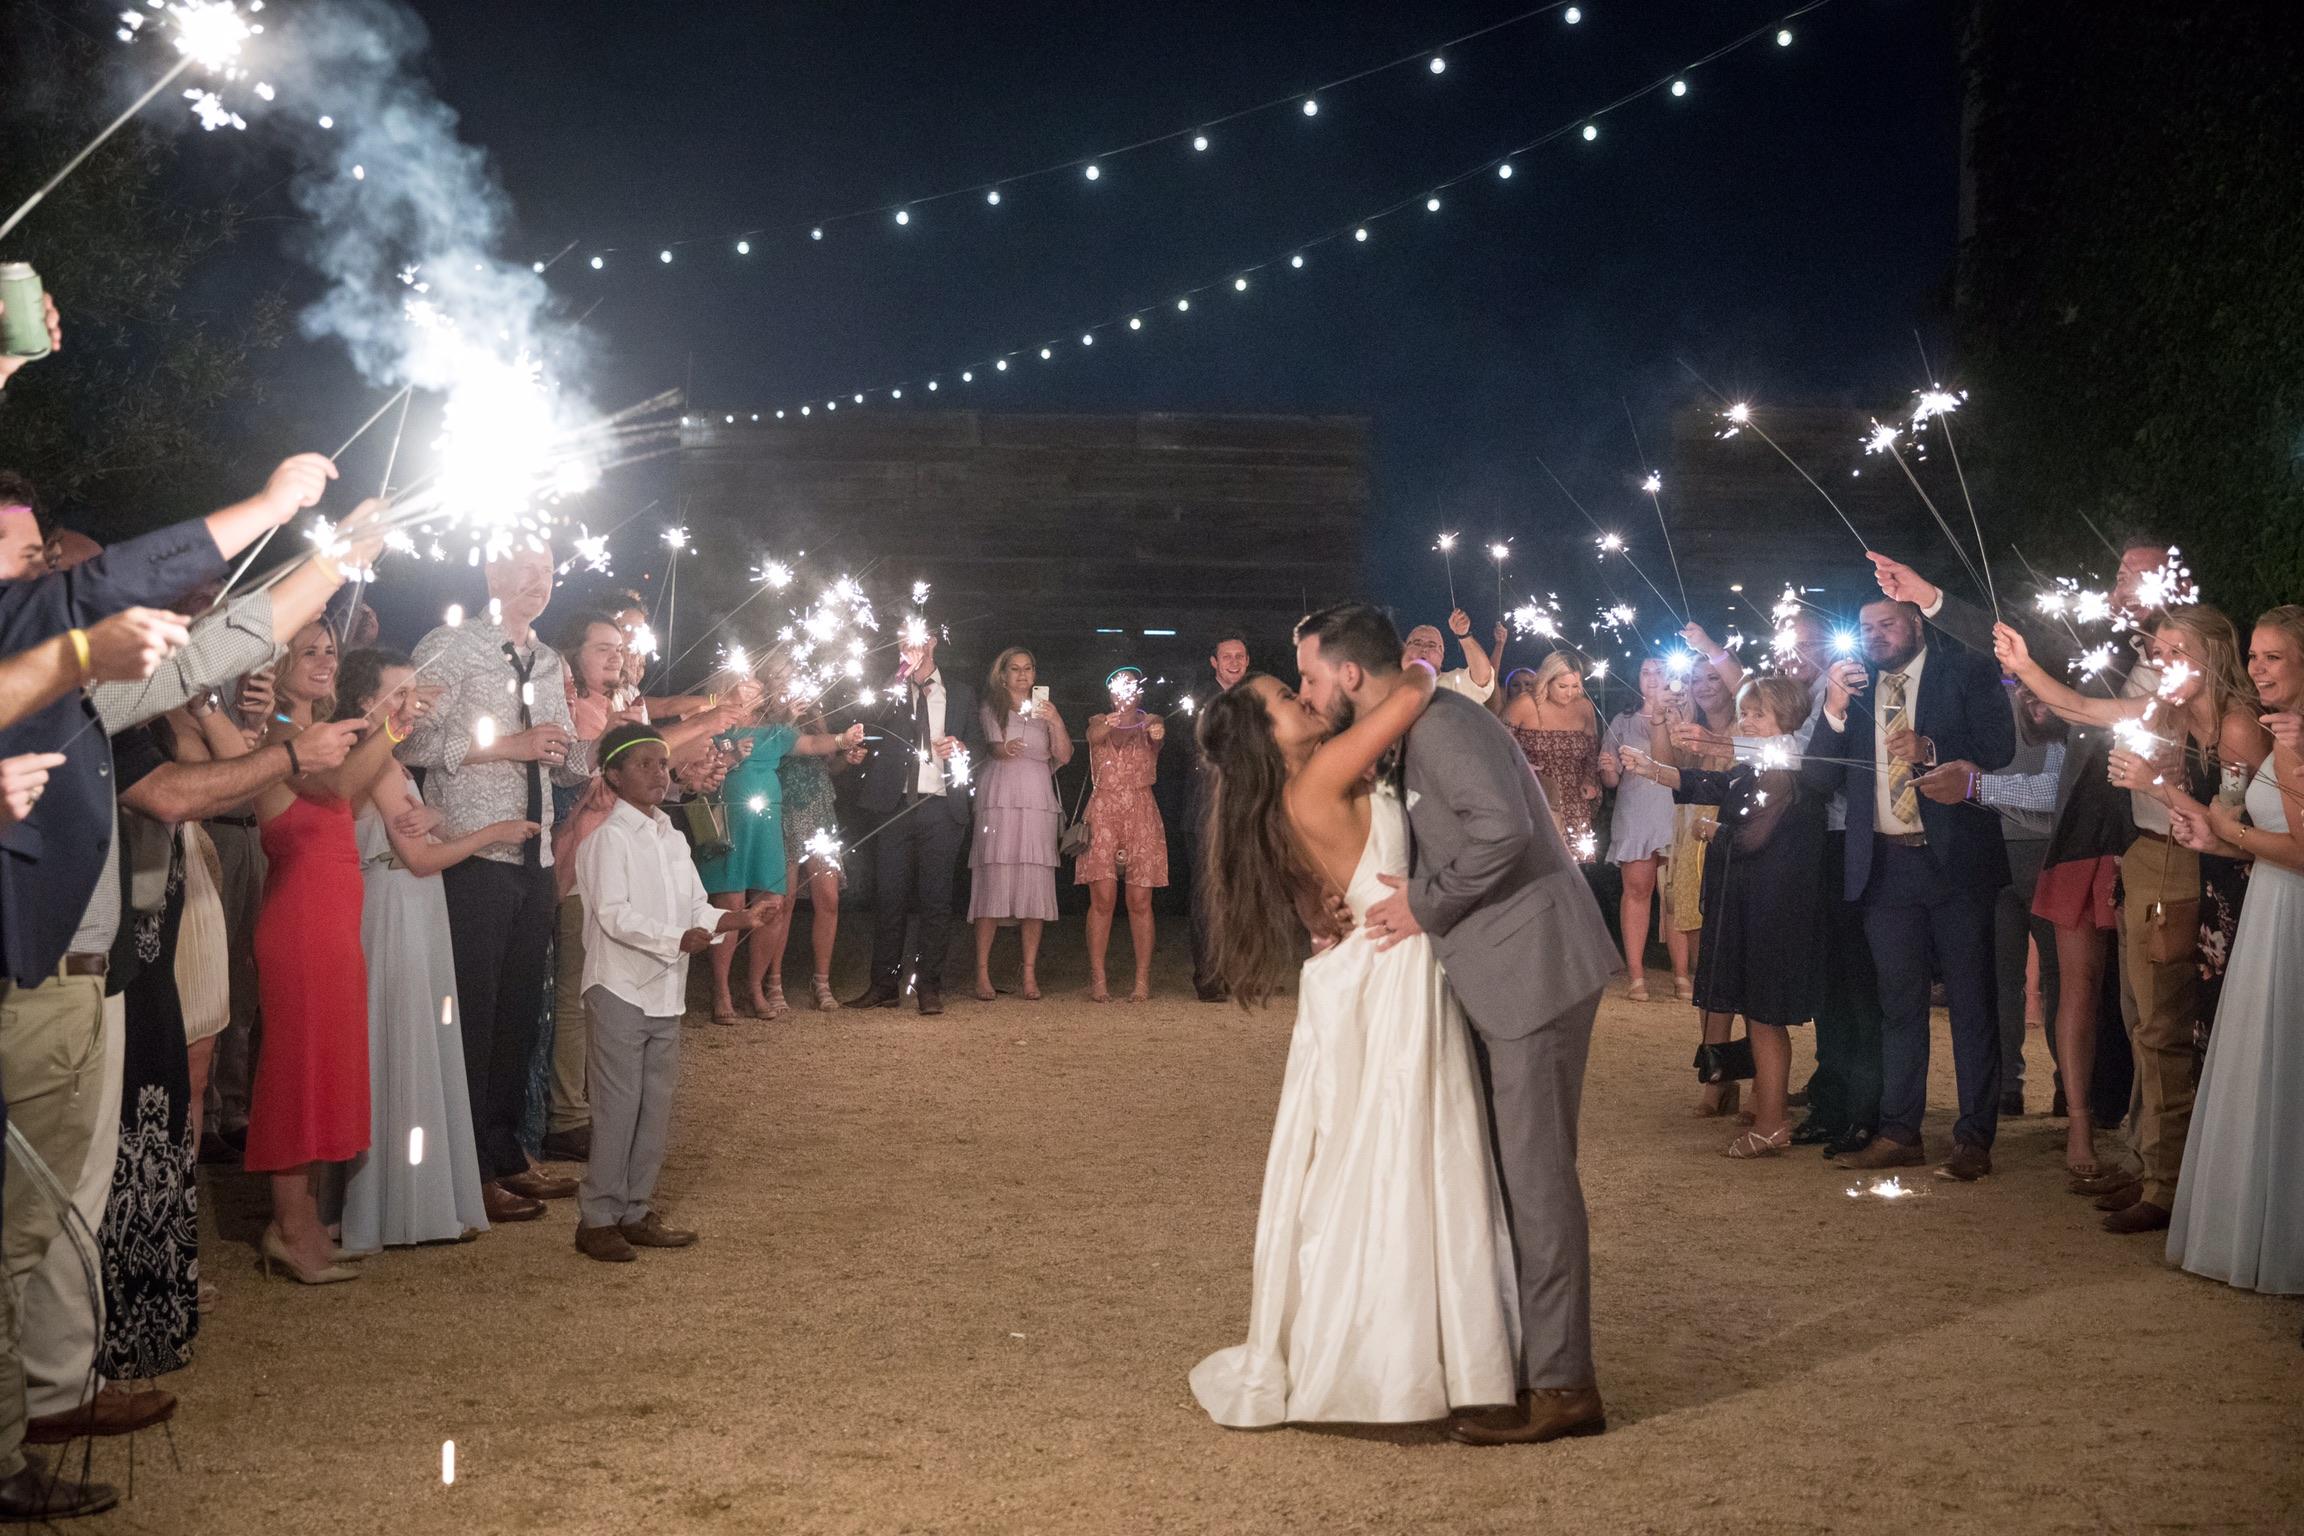 Weddings Unveiled // We're pulling back the veil on Maddi's Fort Worth, Texas wedding! ivoryandink.com